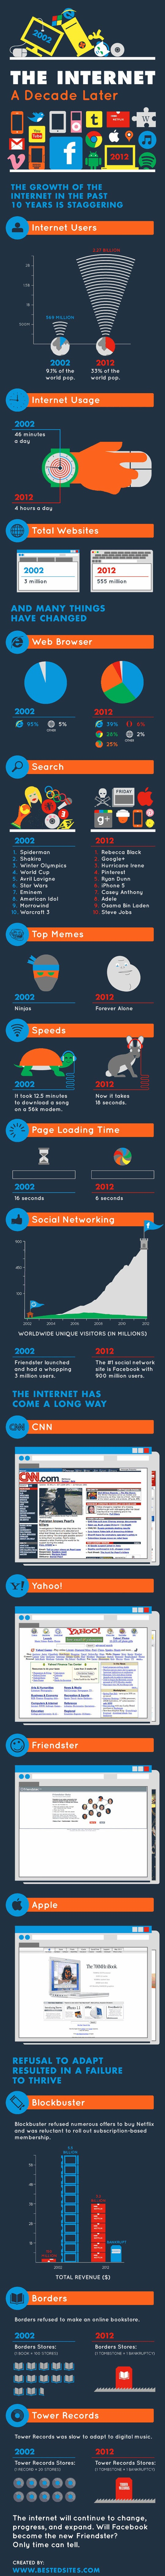 internet 2002-2012